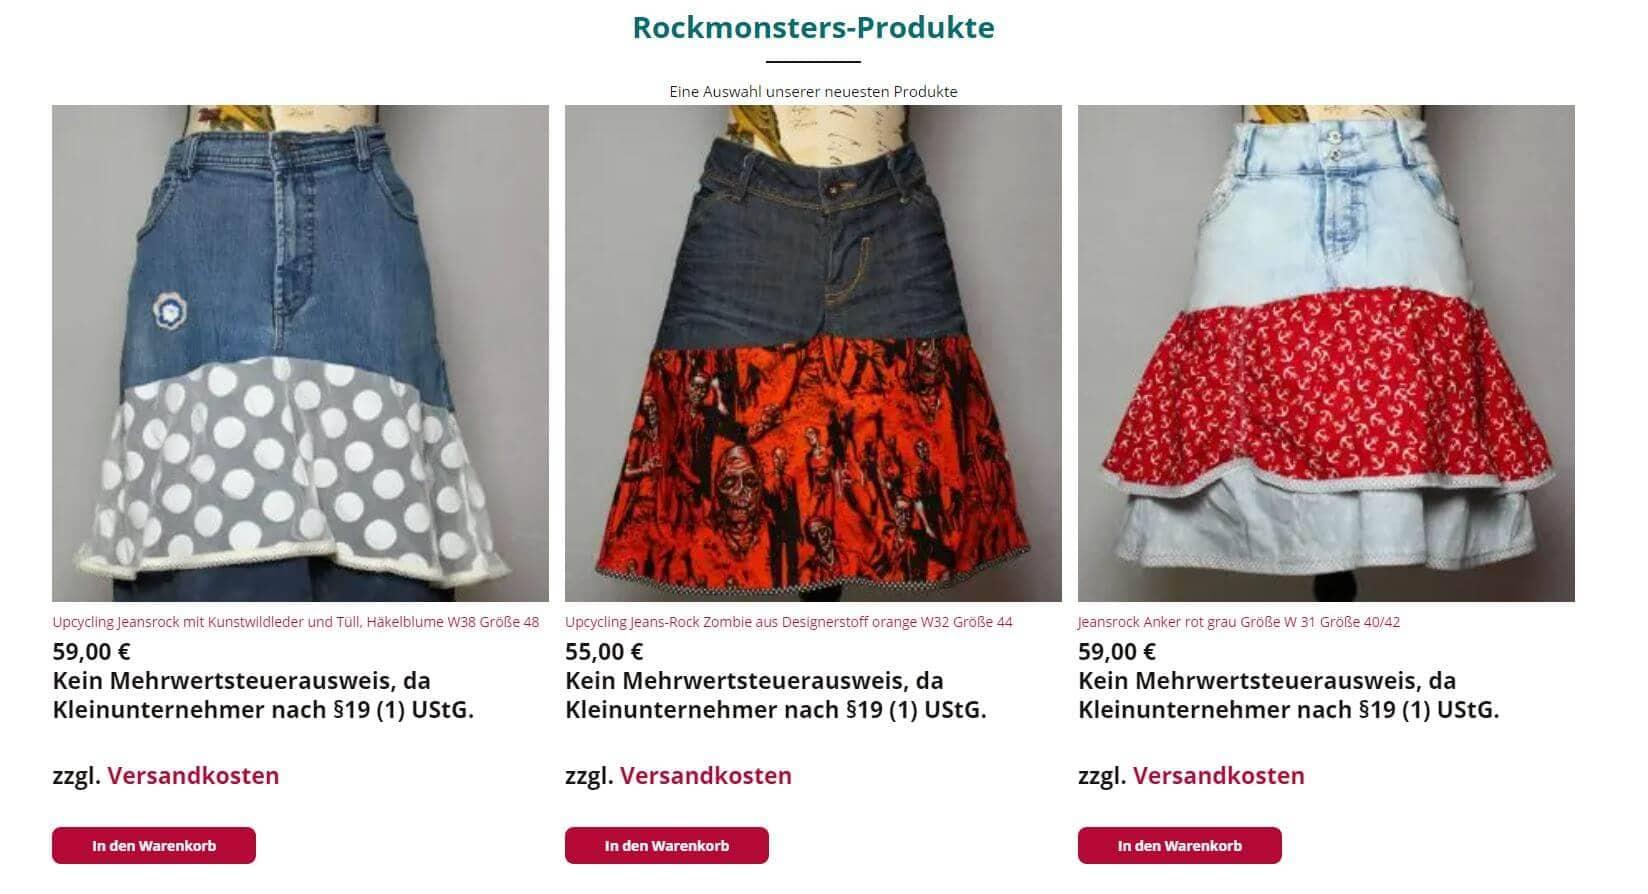 Röcke im Rockmonsters-Shop